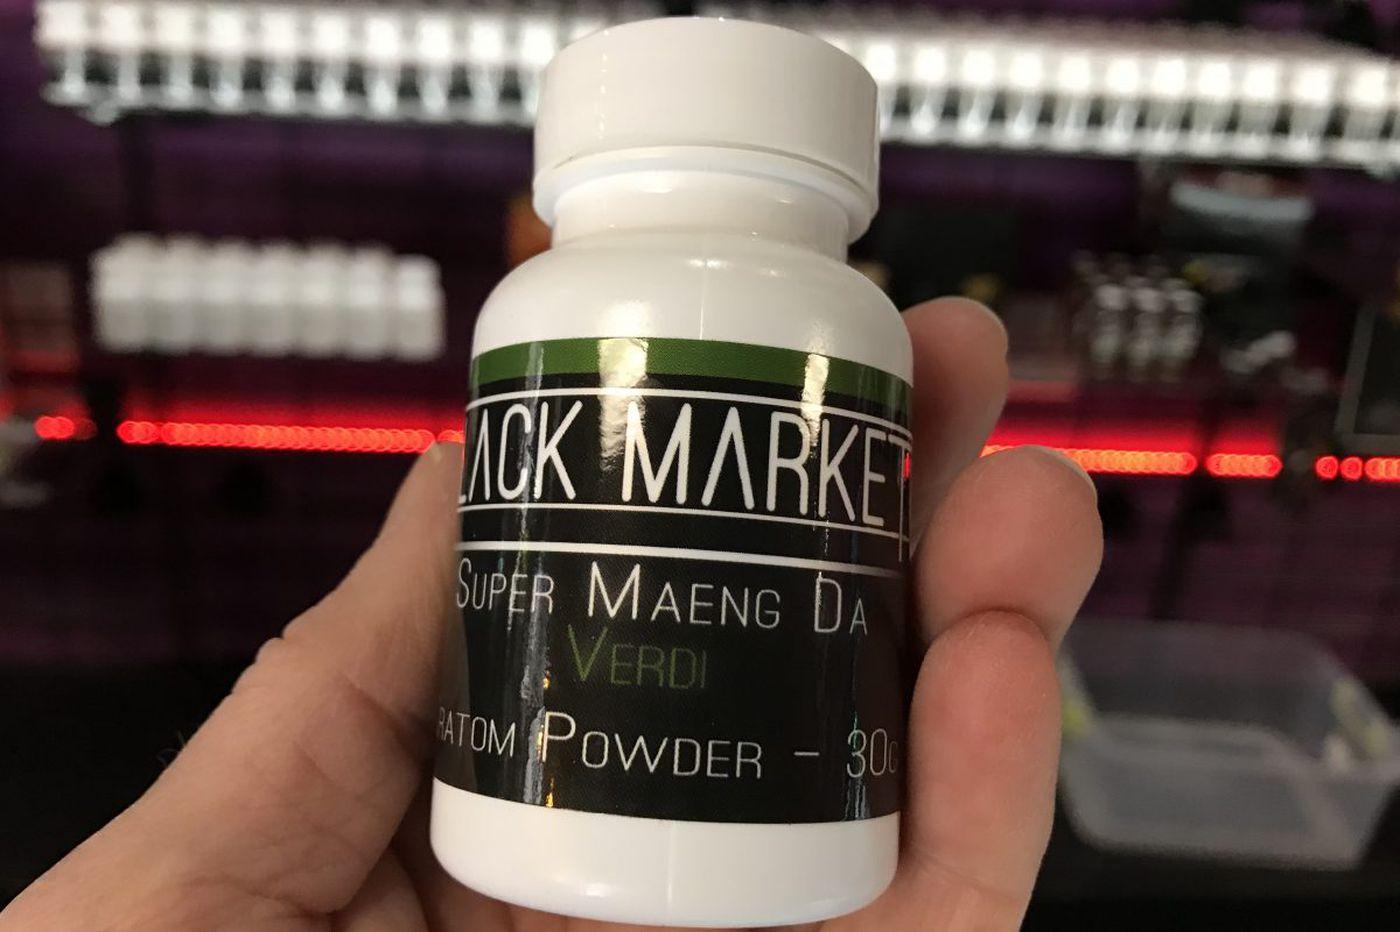 Is kratom a safe herbal remedy or a dangerous opioid?